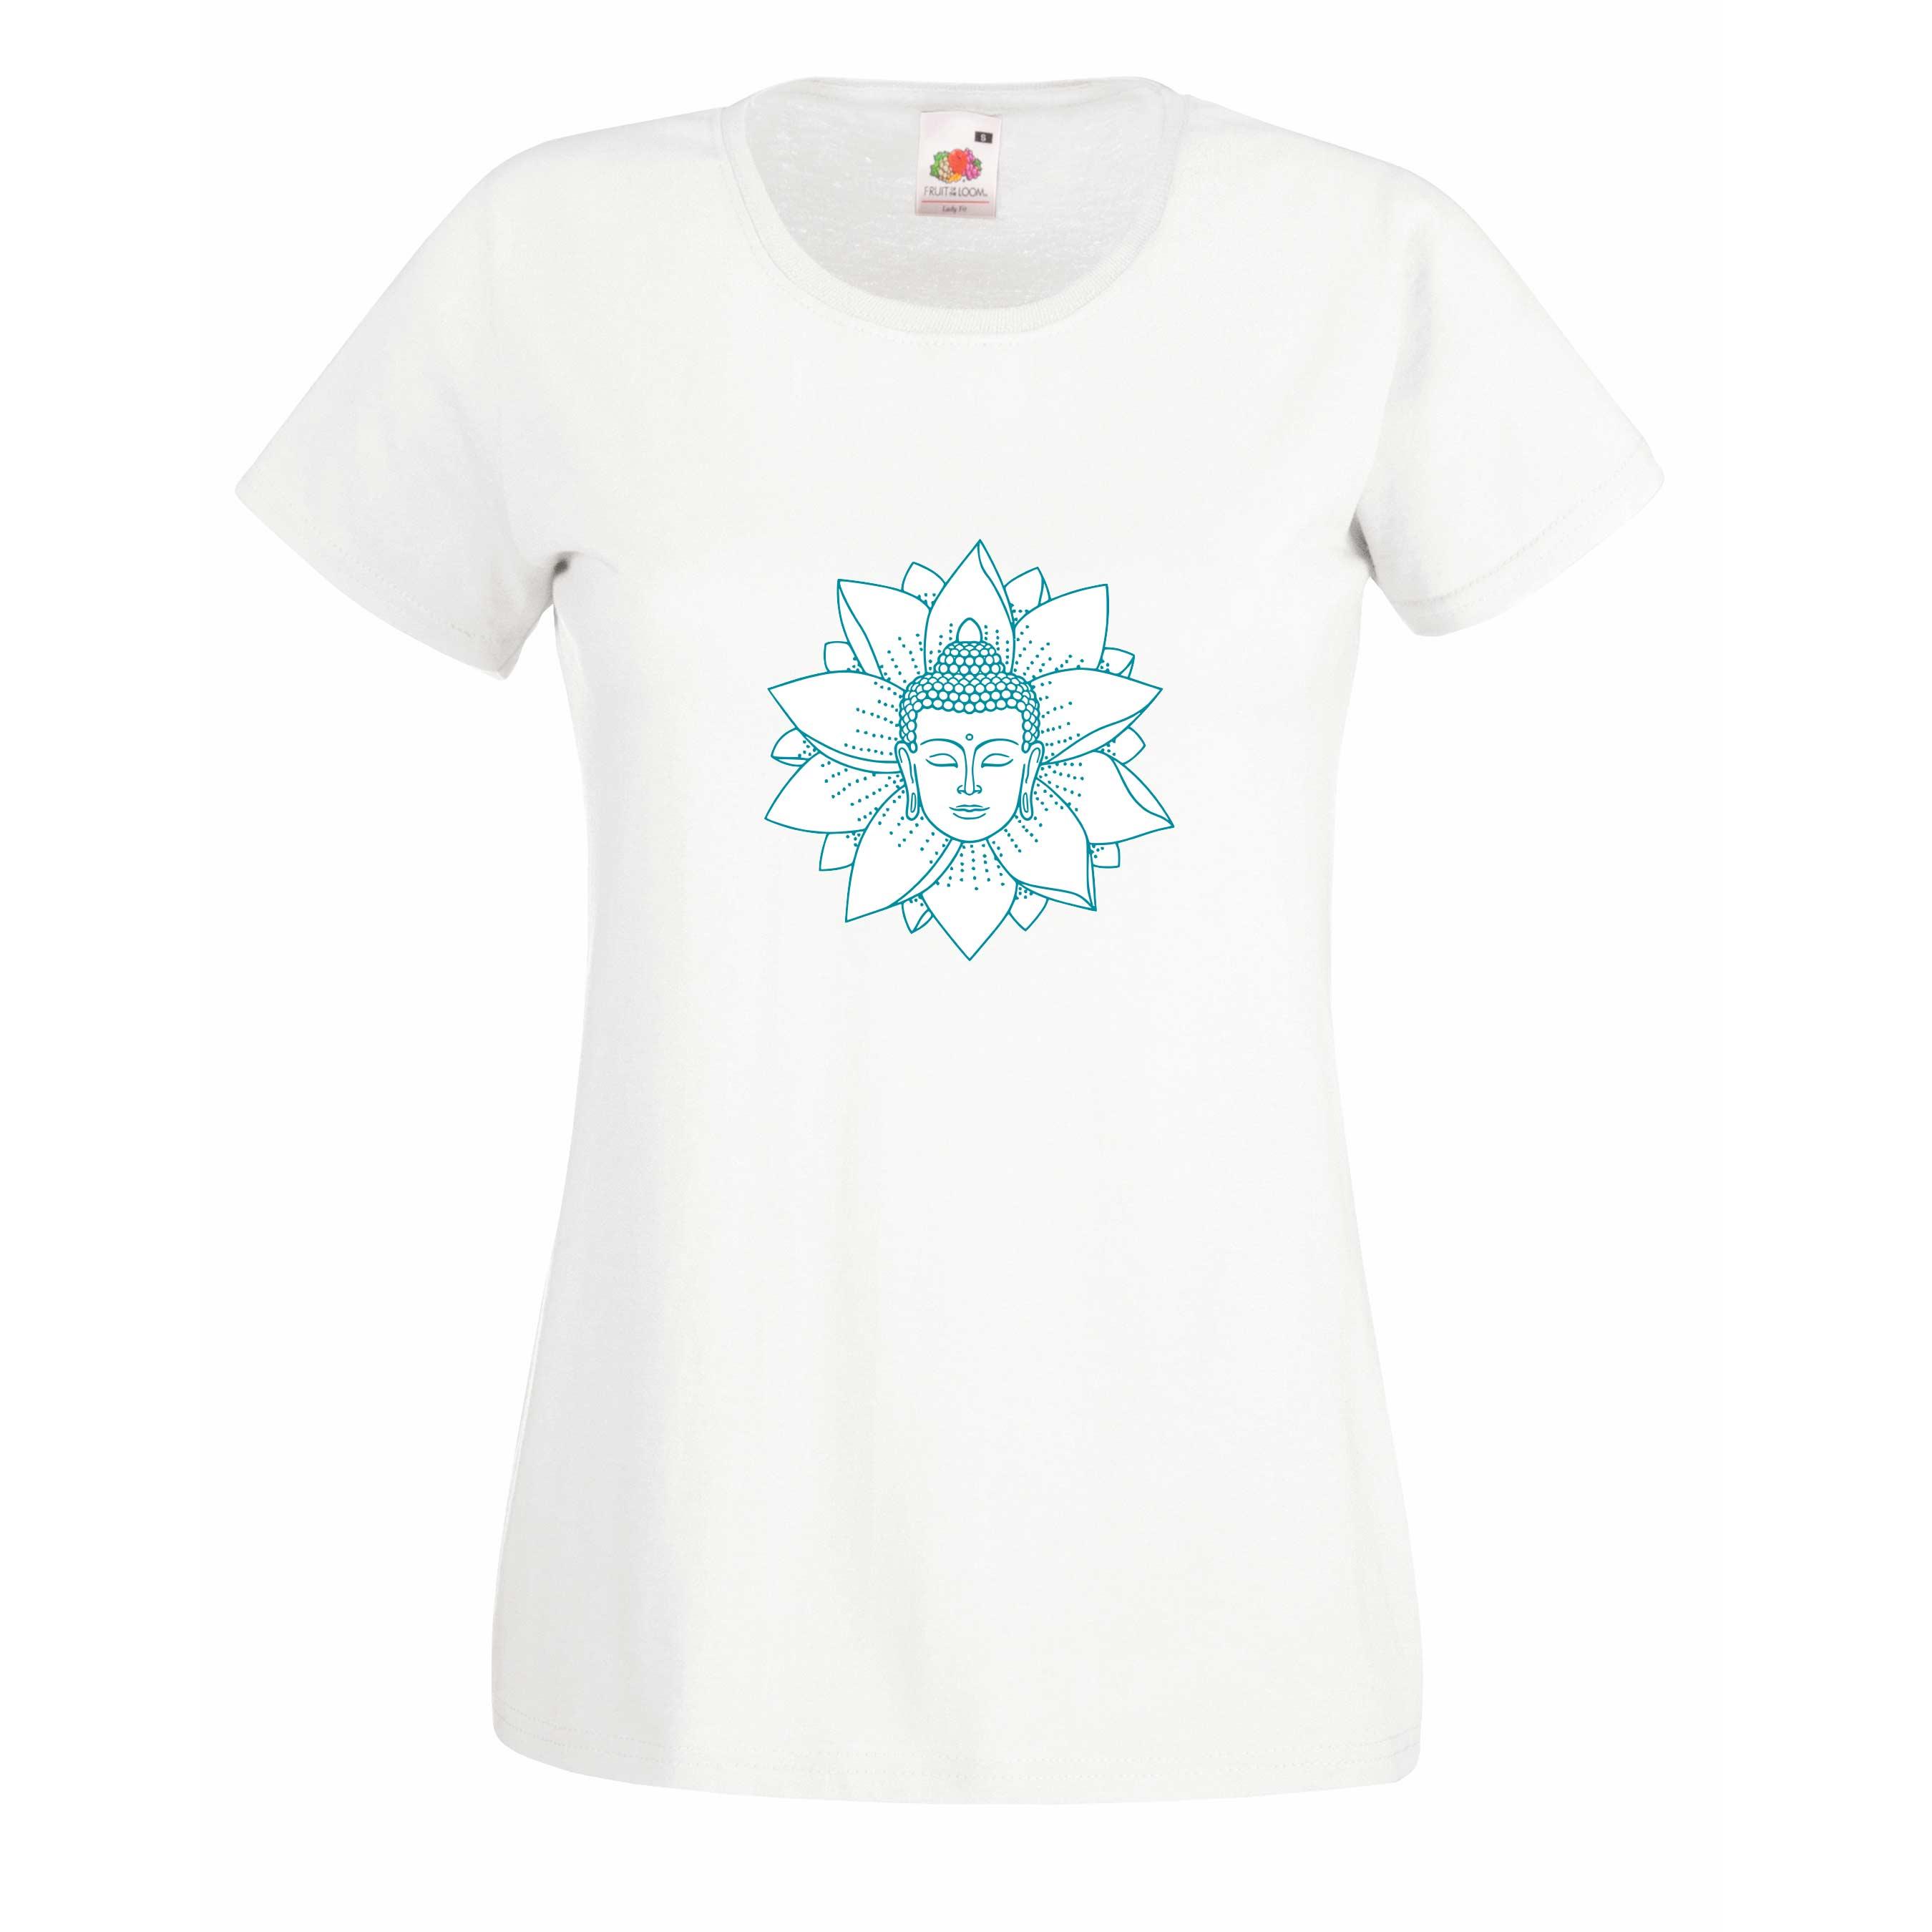 Lotus design for t-shirt, hoodie & sweatshirt